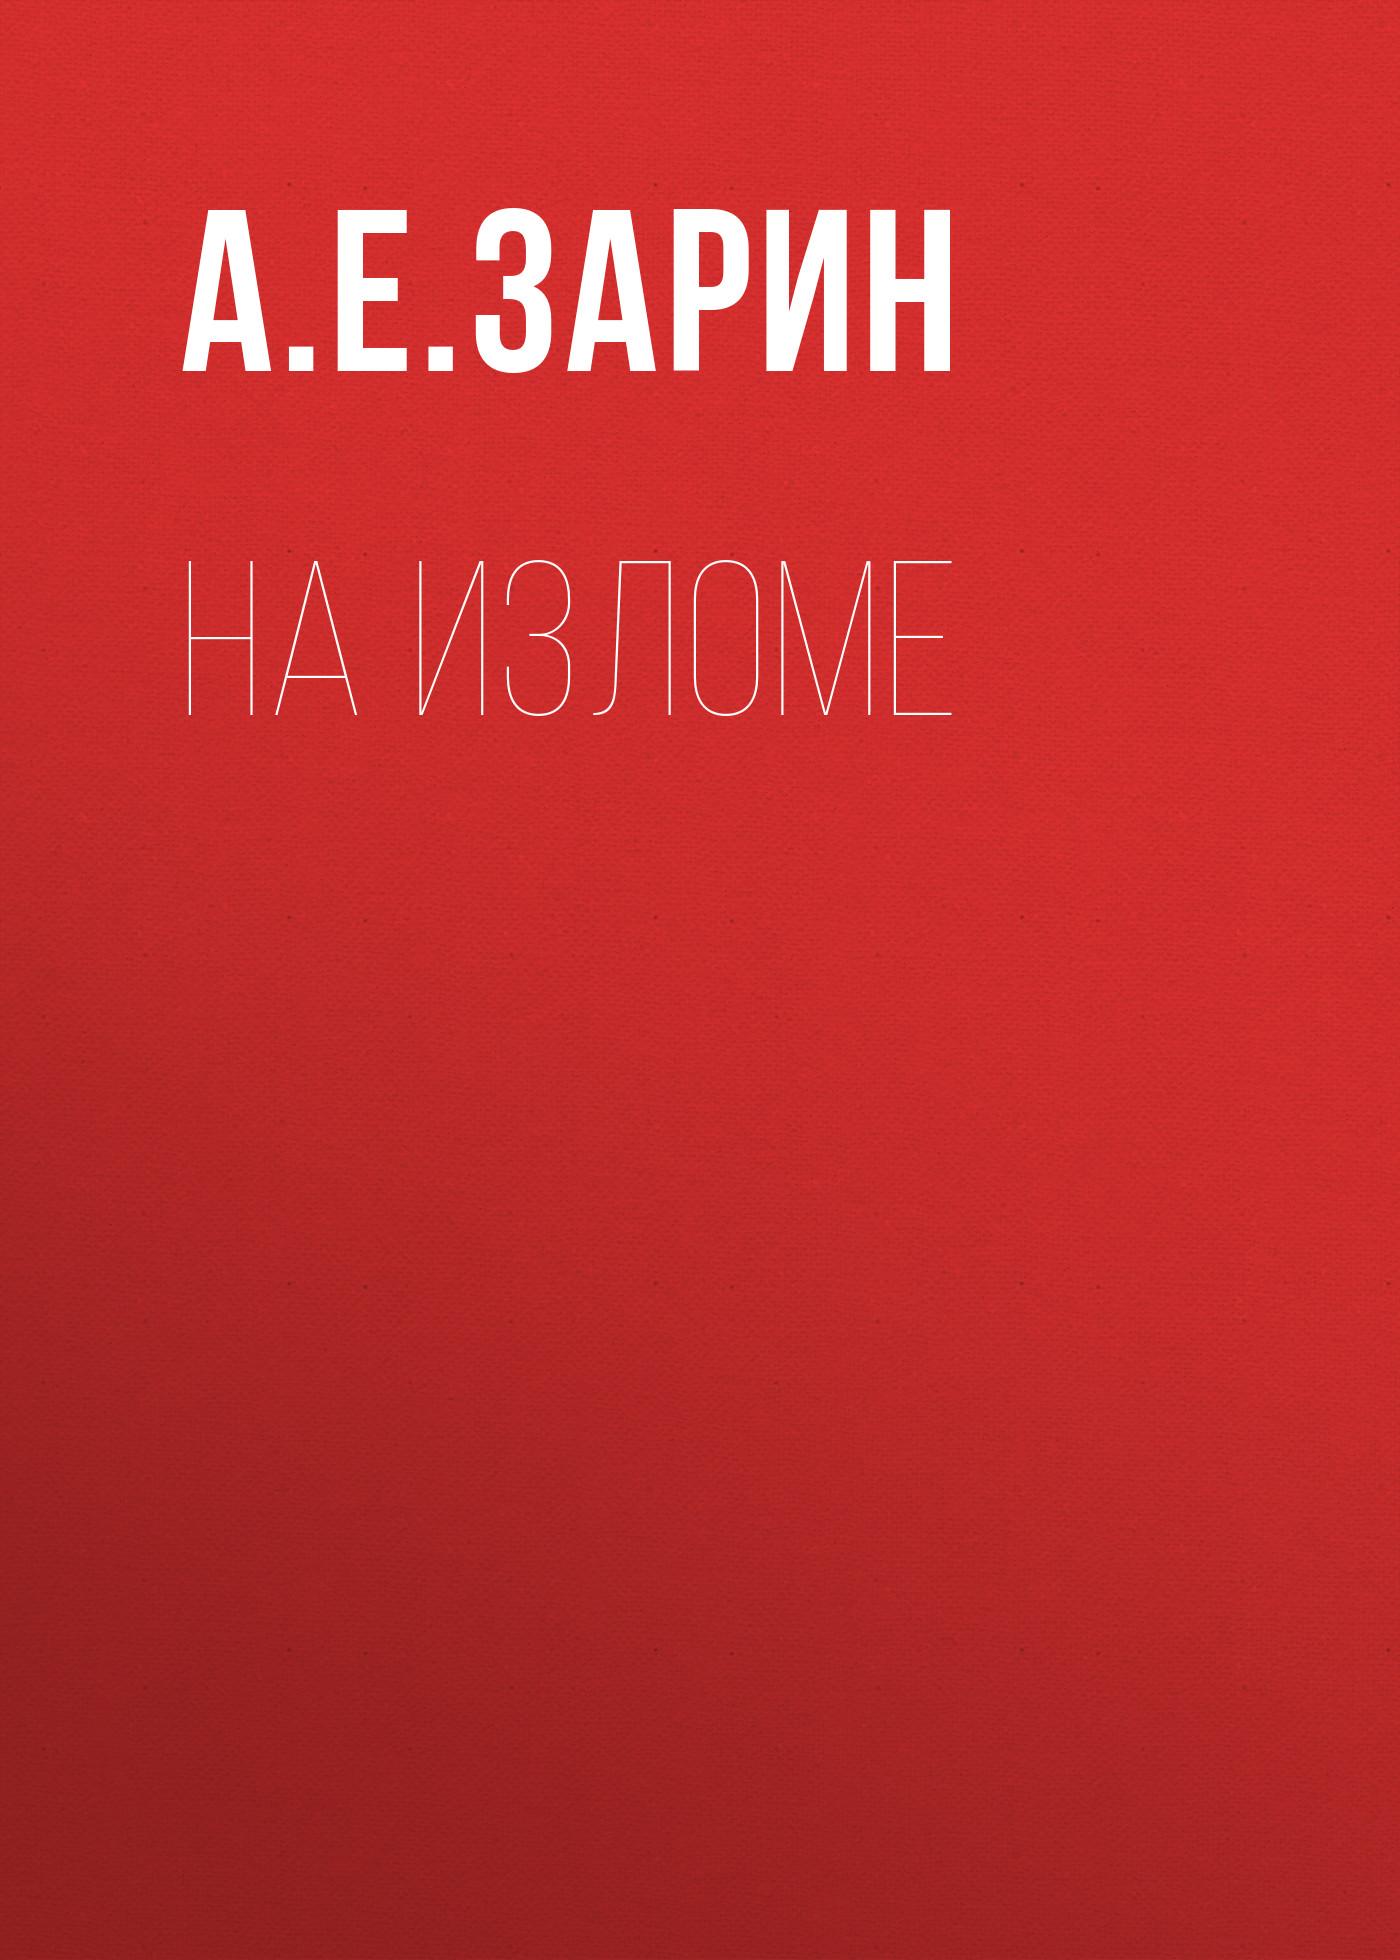 А. Е. Зарин На изломе